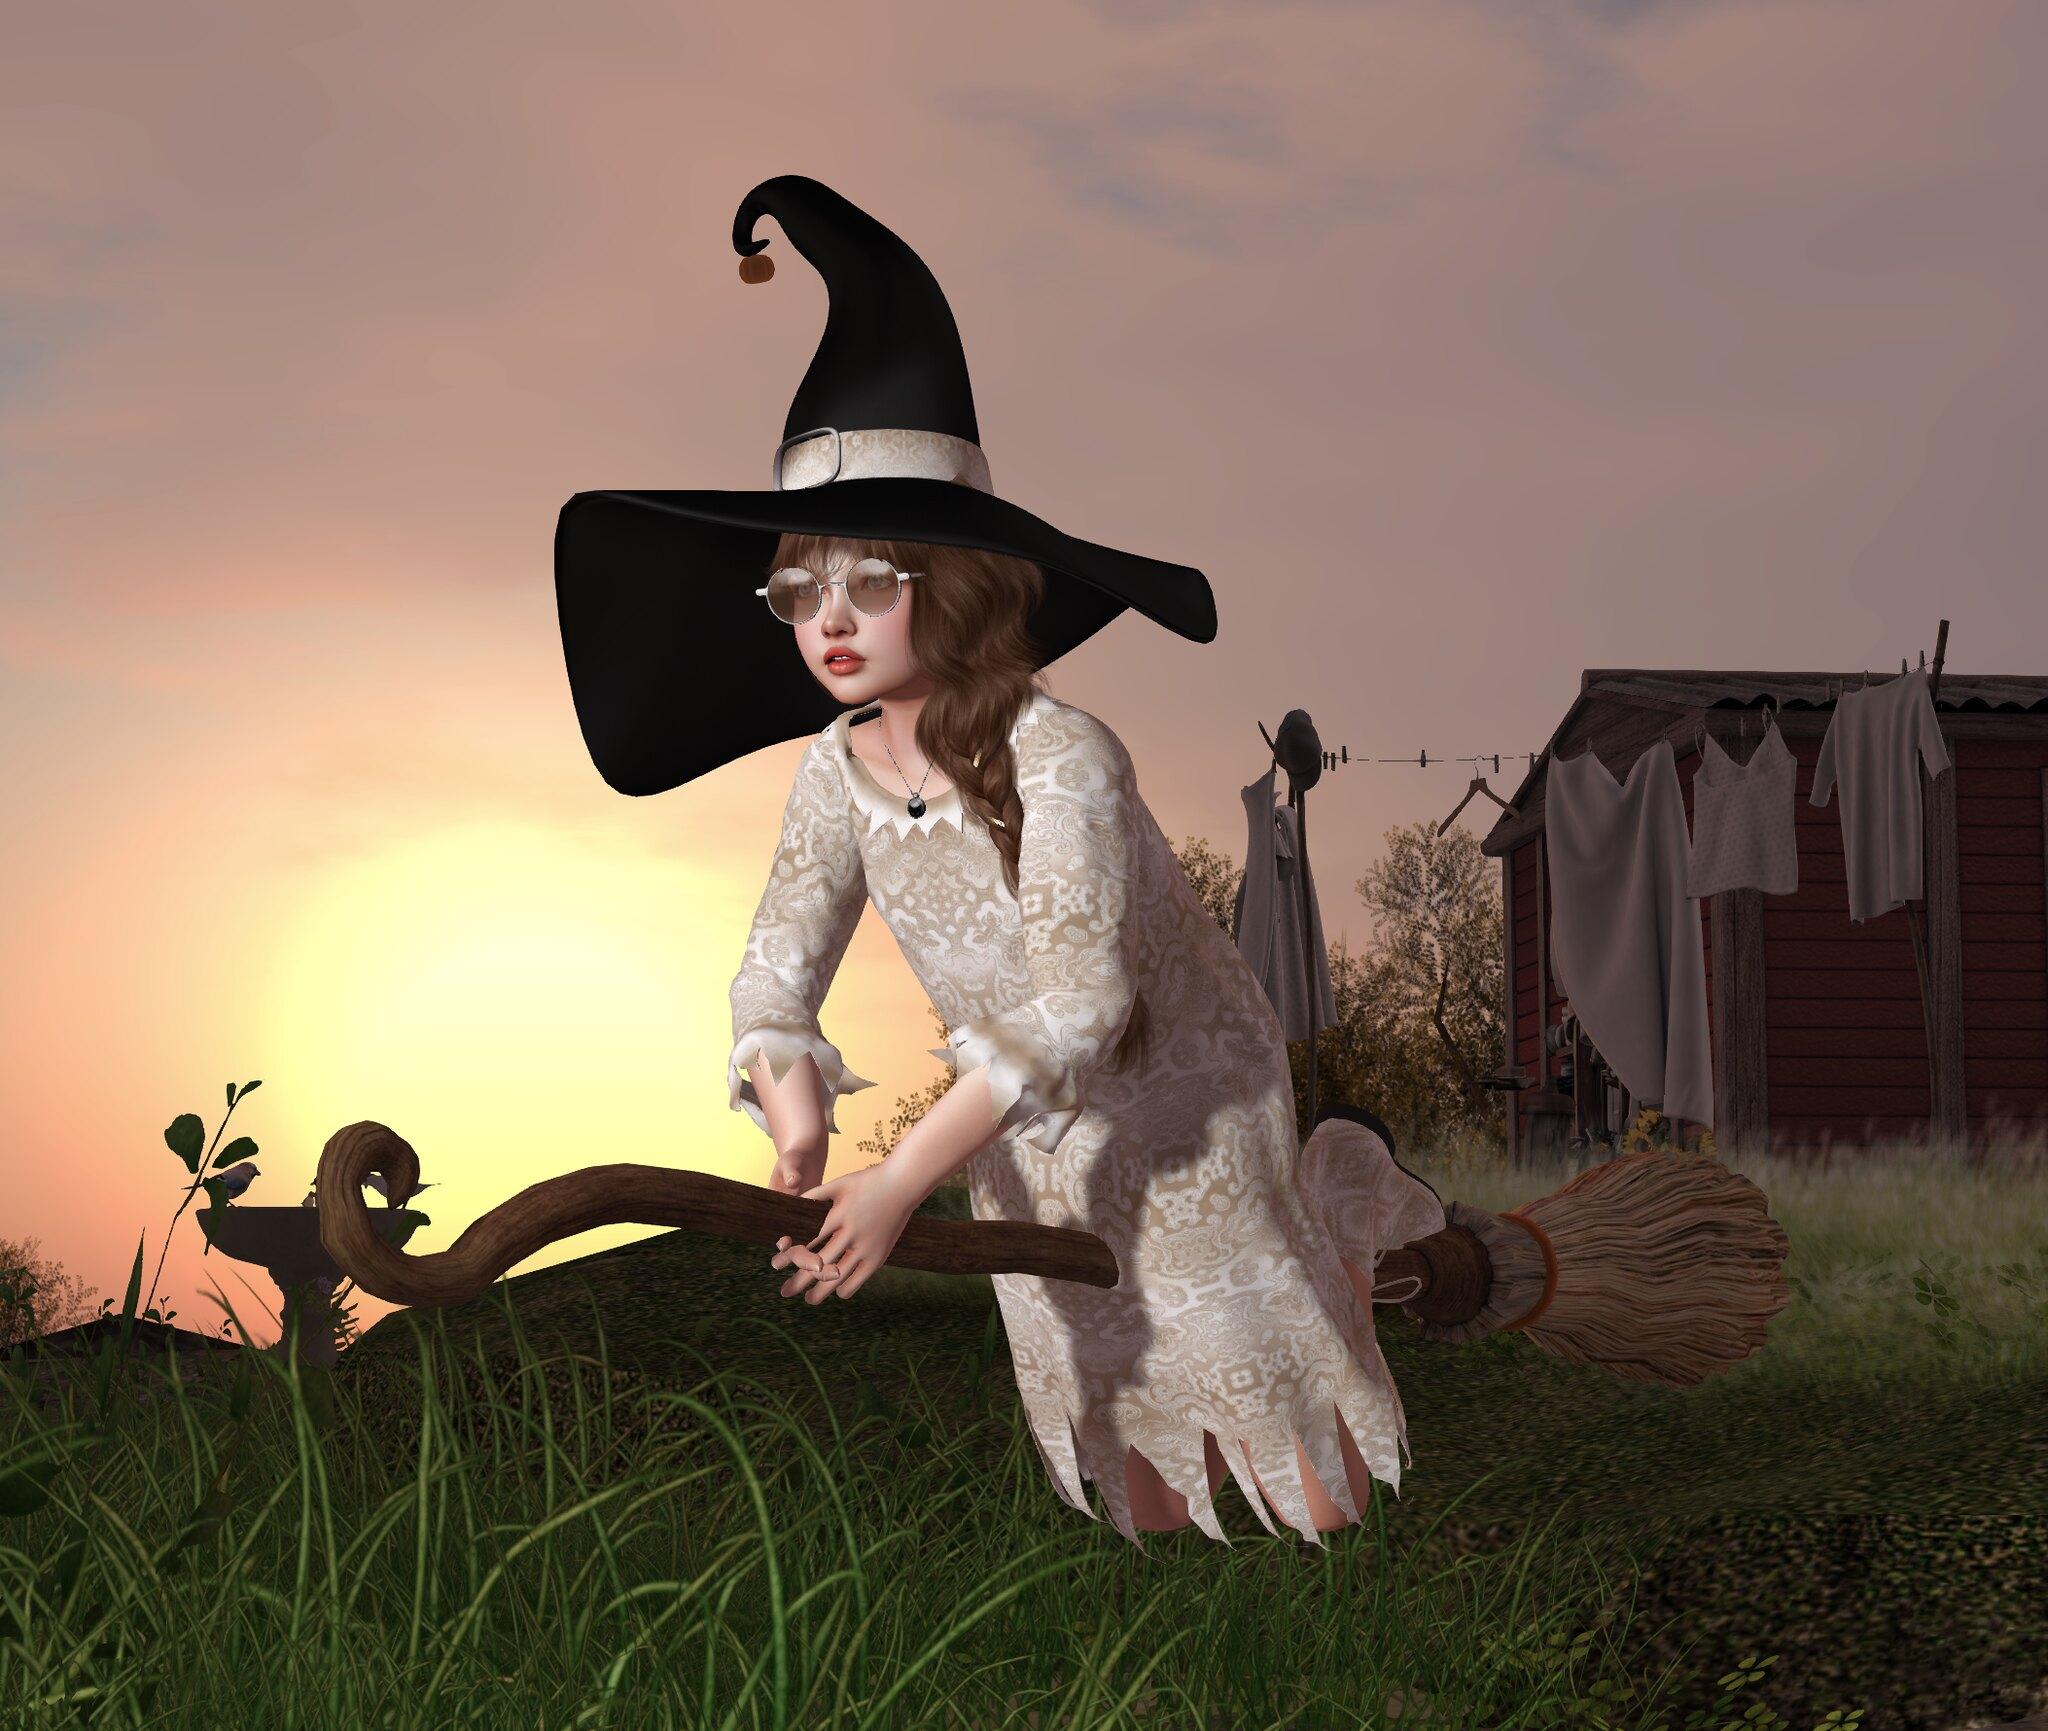 White Witch Broom_crop